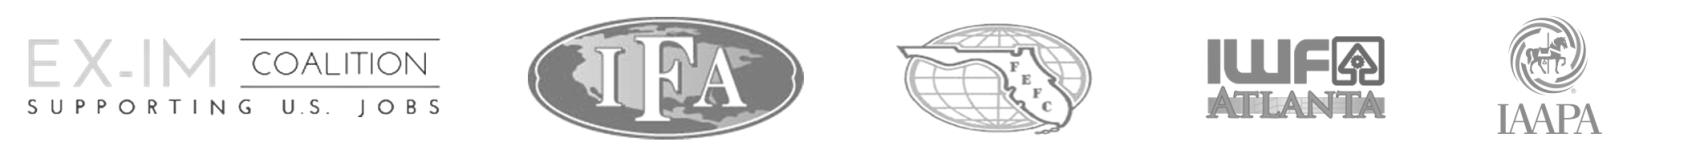 banner 2 gray